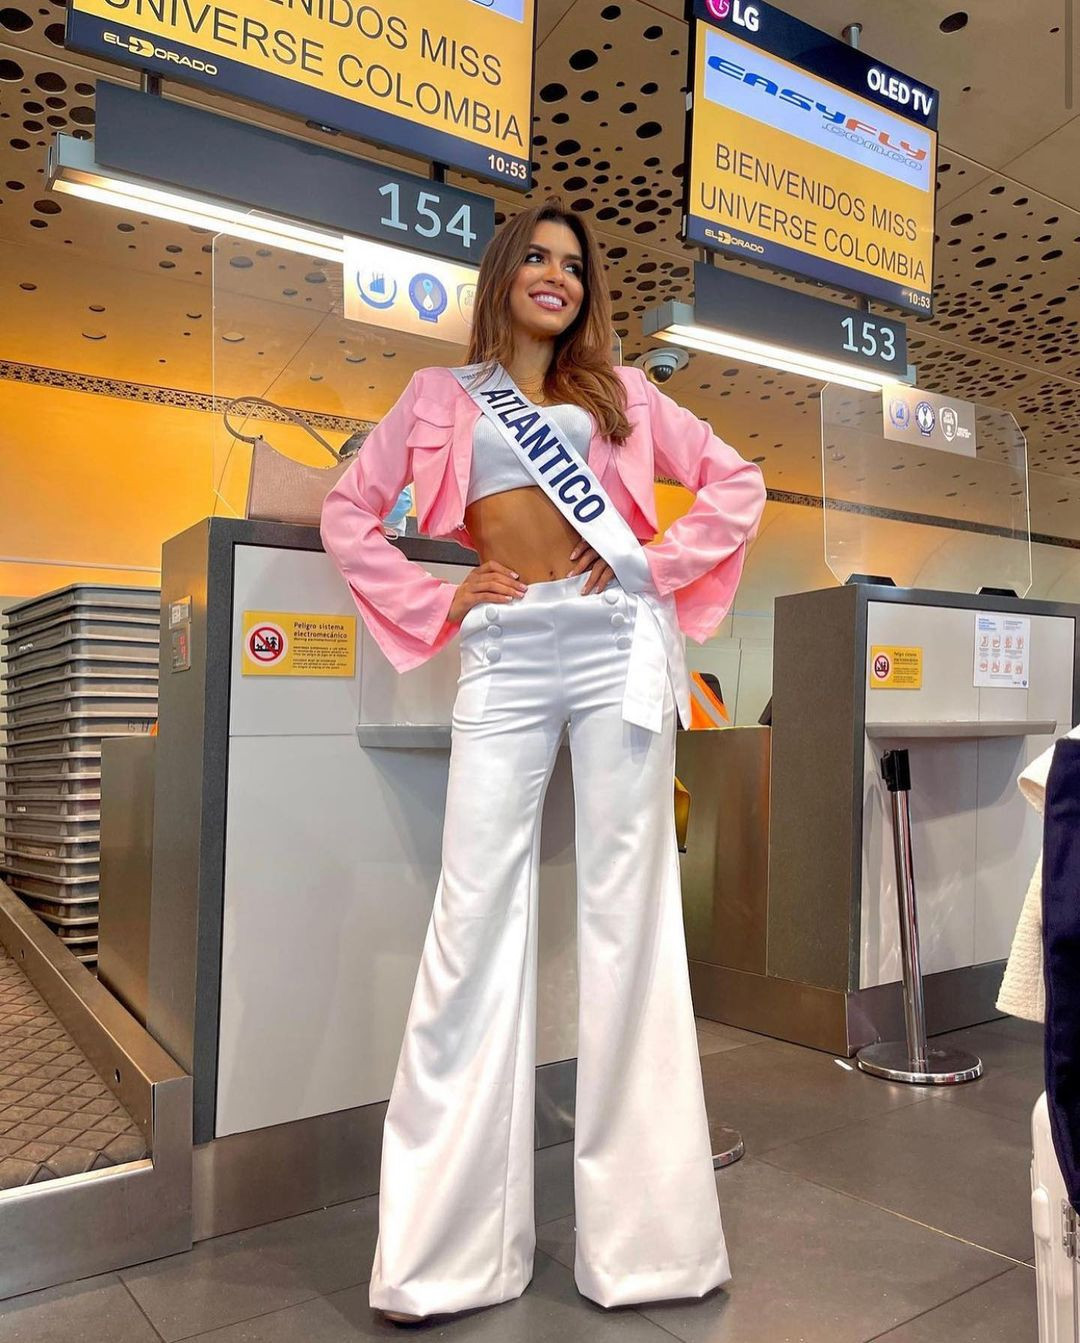 candidatas a miss universe colombia 2021. final: 18 oct. sede: neiva. - Página 4 52S1u2